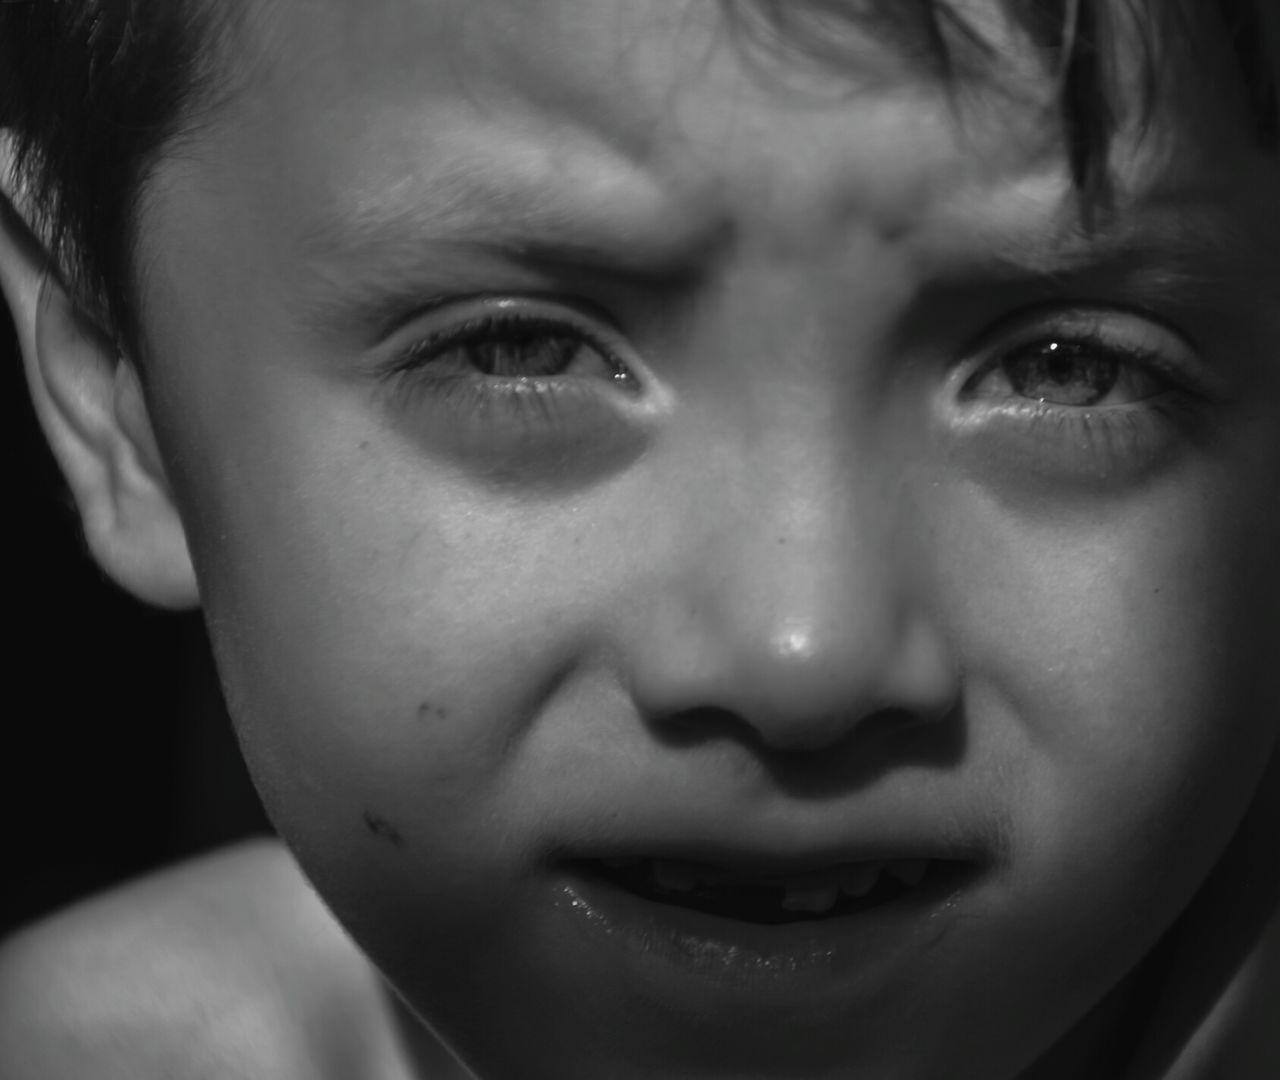 my beautiful son Autism Awareness Autumn Bnwportrait Portrait Bnw Black And White Dramatic Kid Child Portrait